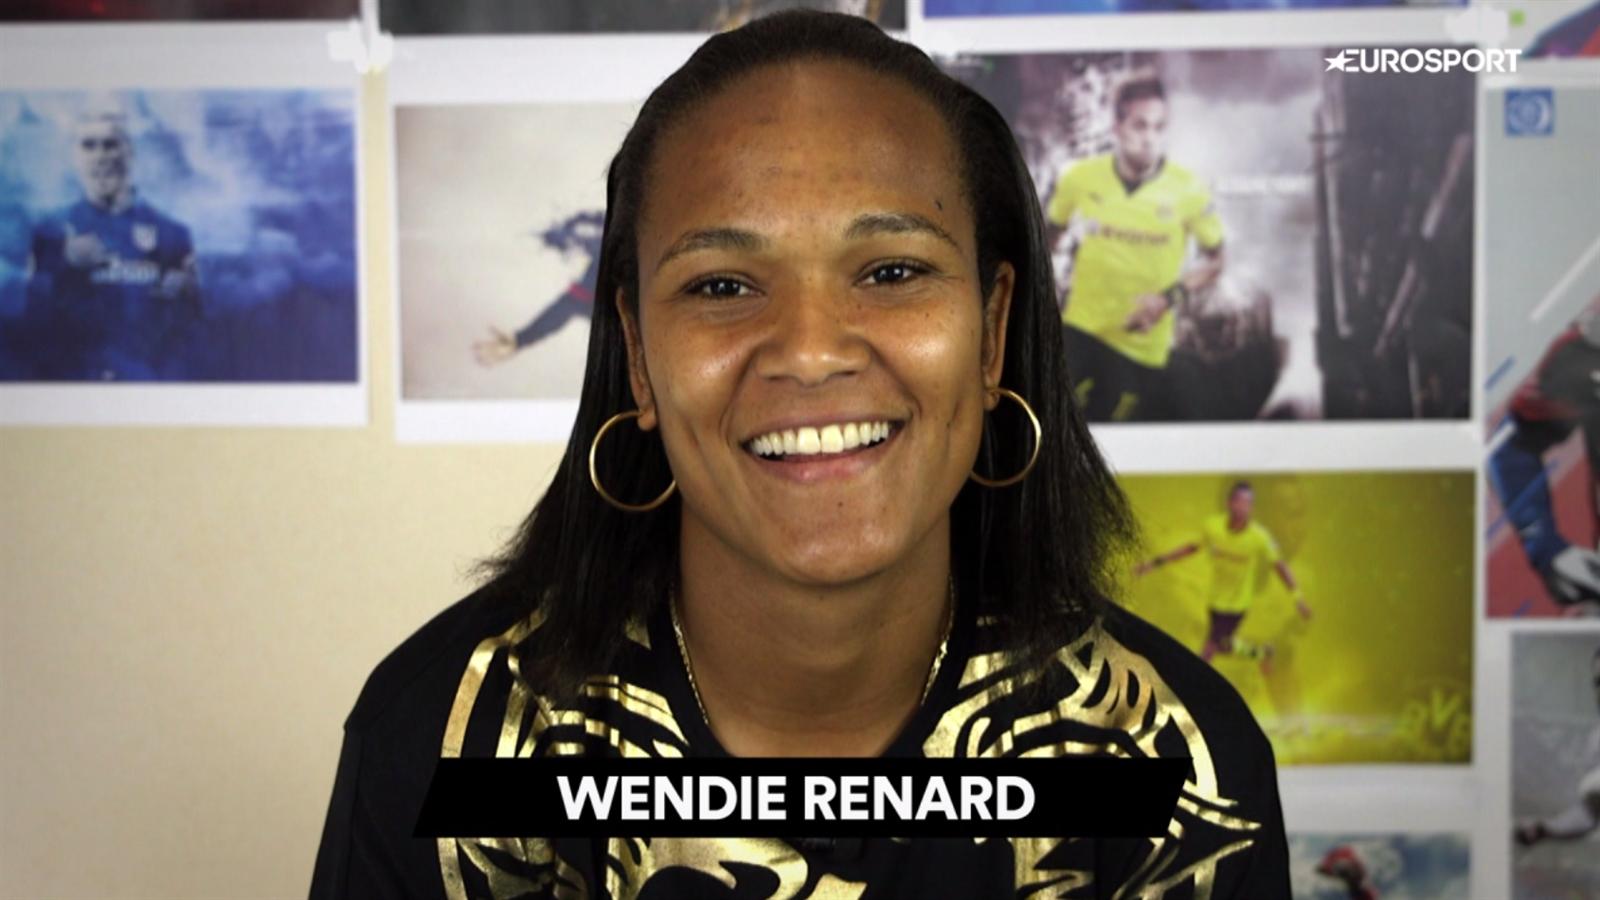 Wendy renard interview - Video Euro 2017 L Interview Dilemme De Wendie Renard Euro F Video Eurosport